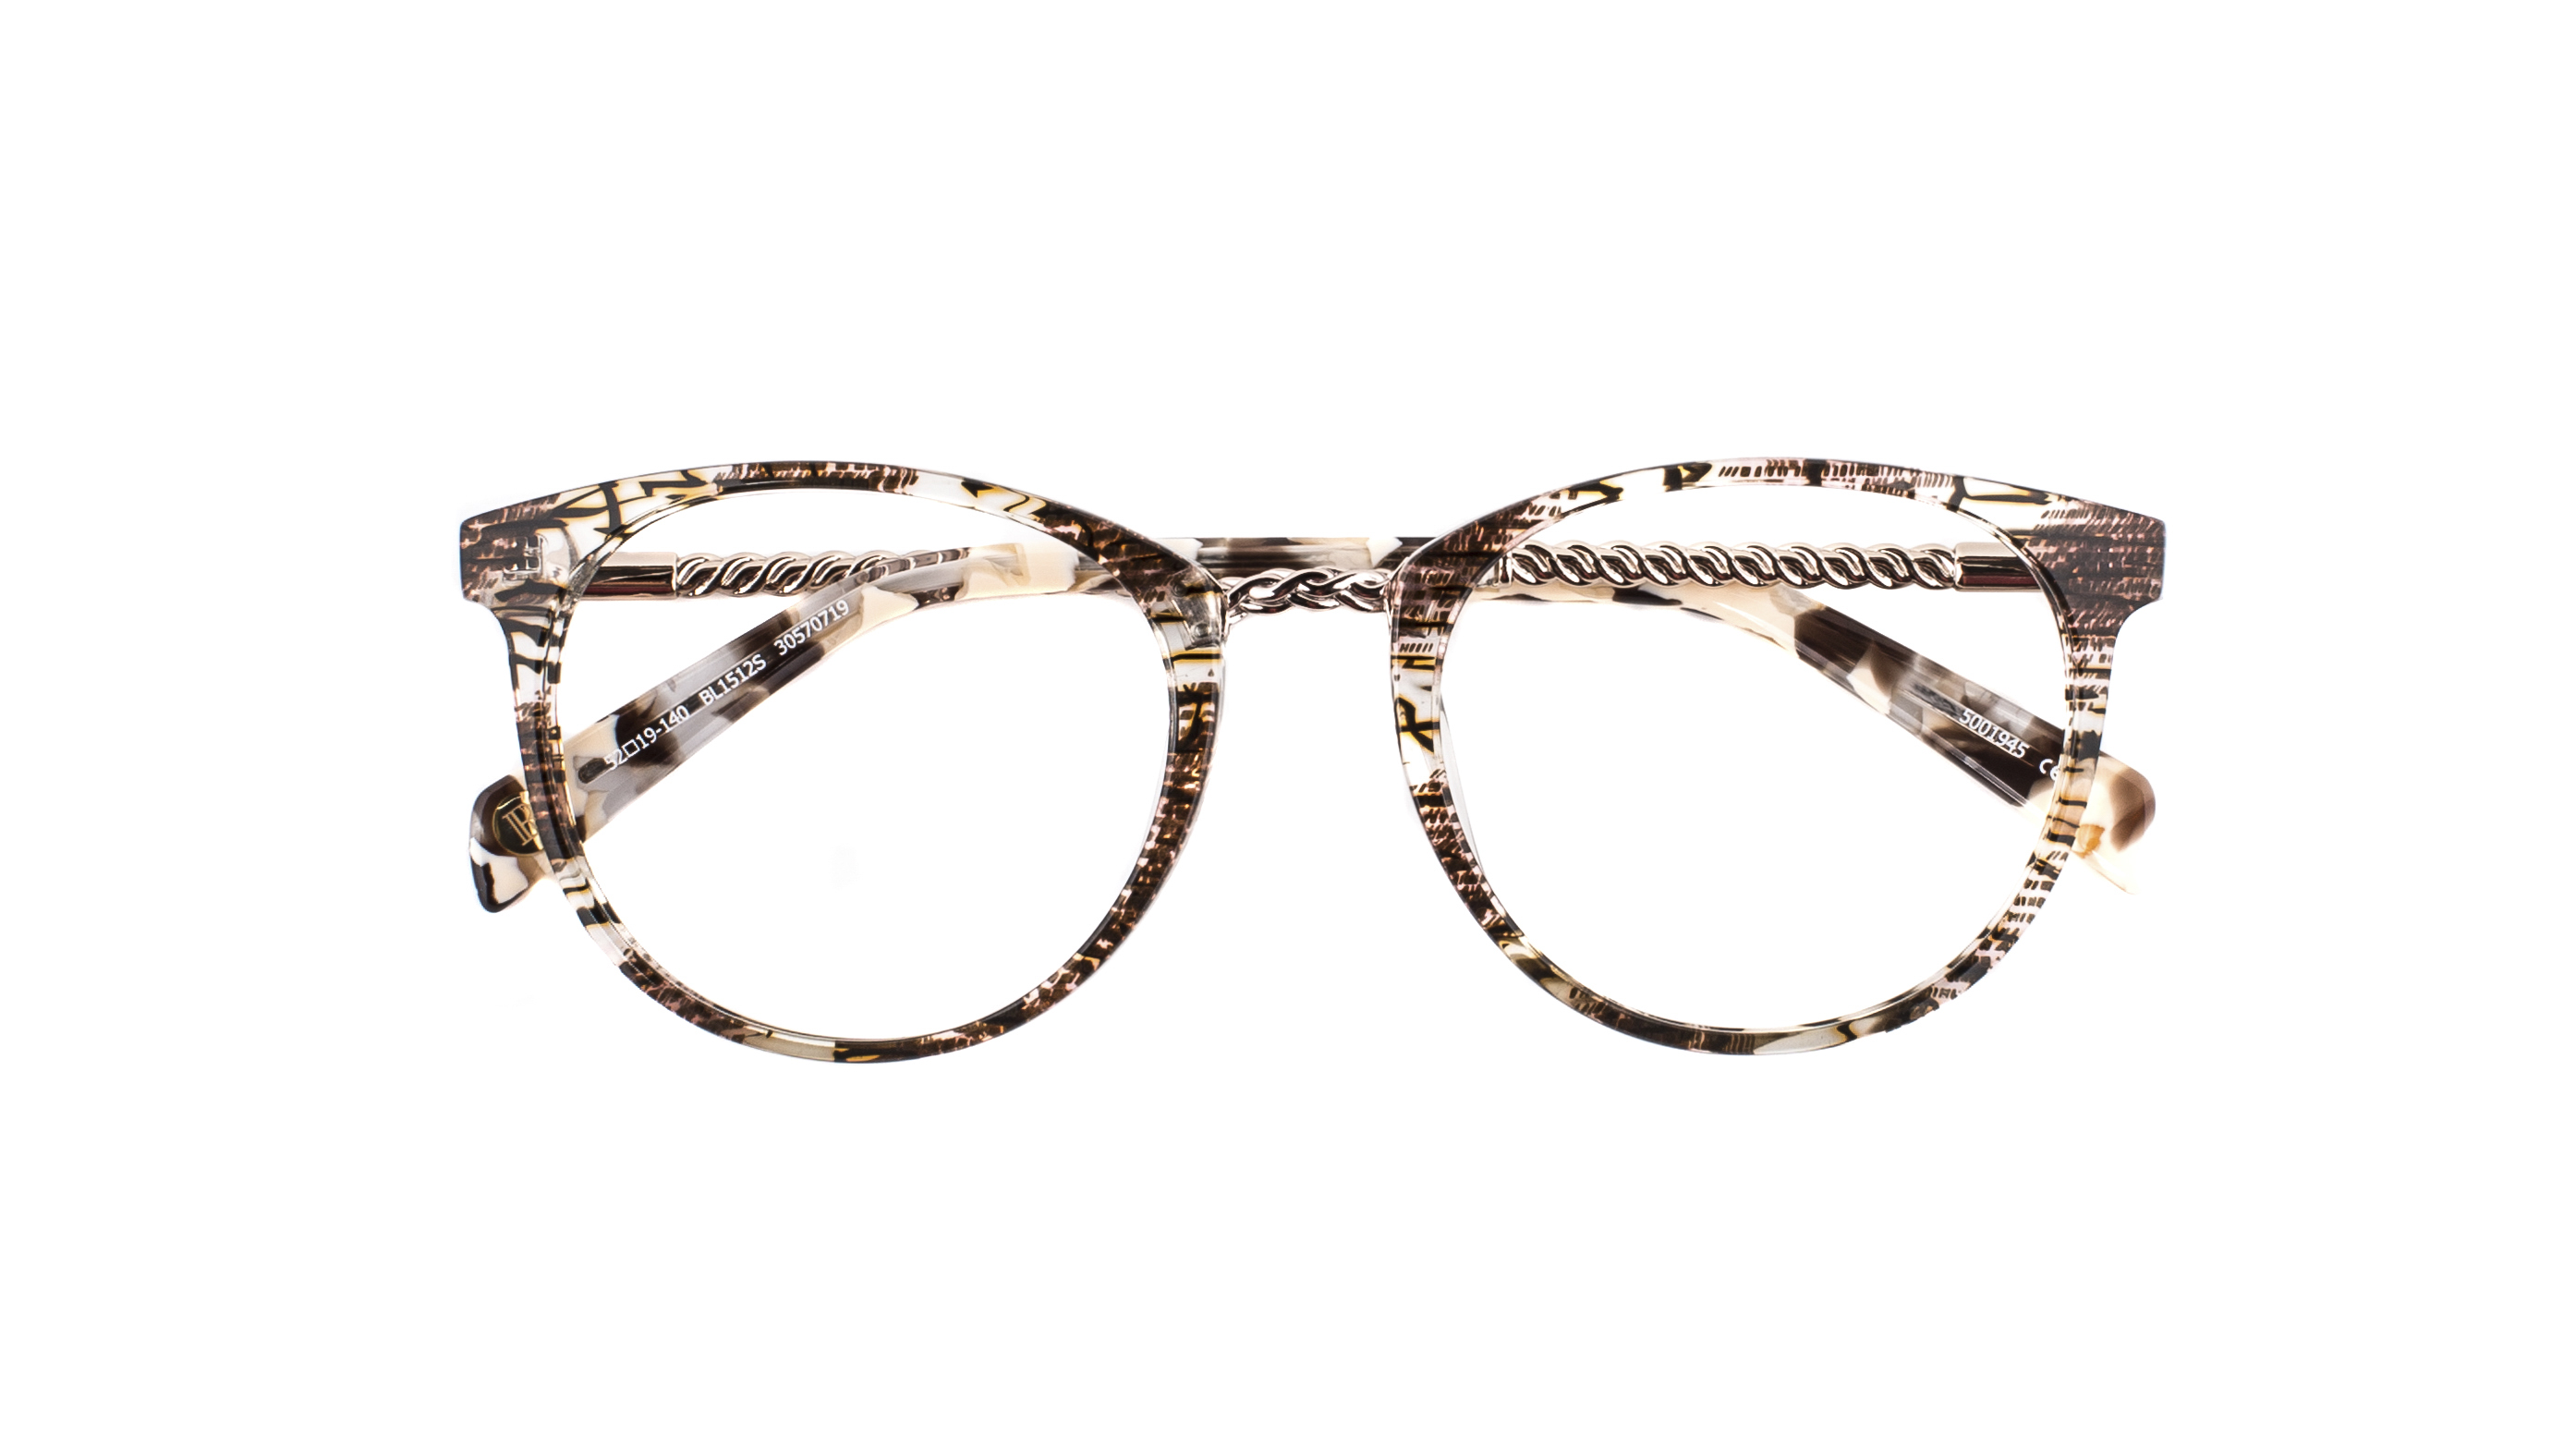 Balmain x Specsavers BL1512S 30570719 - RRP 2 pairs single vision $459 (2)